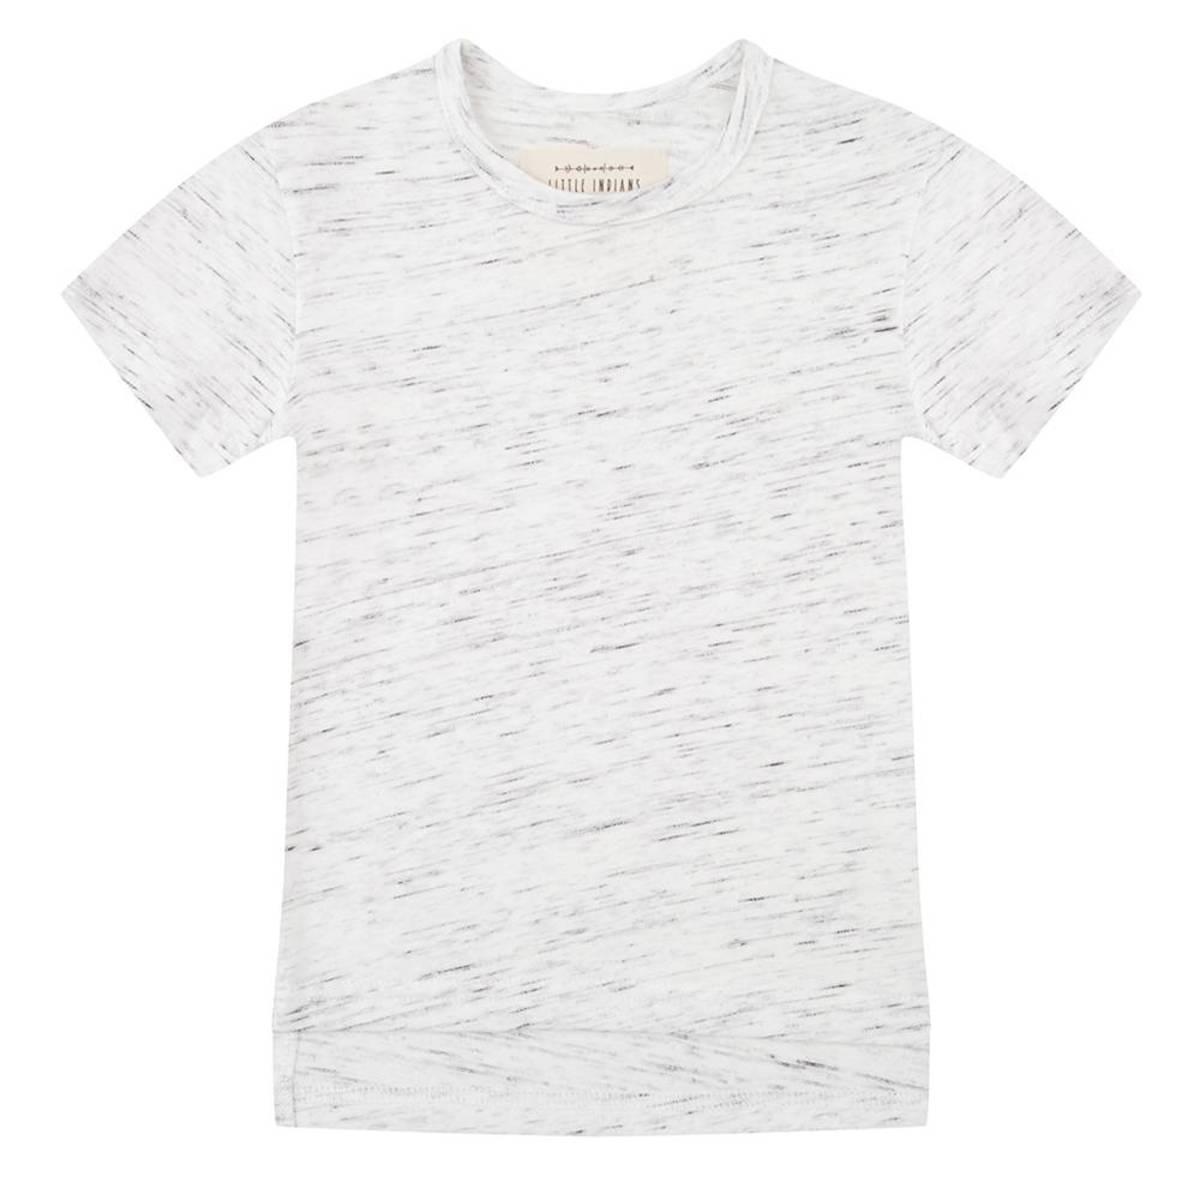 Hauts bébé Tee-Shirt manches courtes Marmer Gris - 6/9 mois Tee-Shirt manches courtes Marmer Gris - 6/9 mois